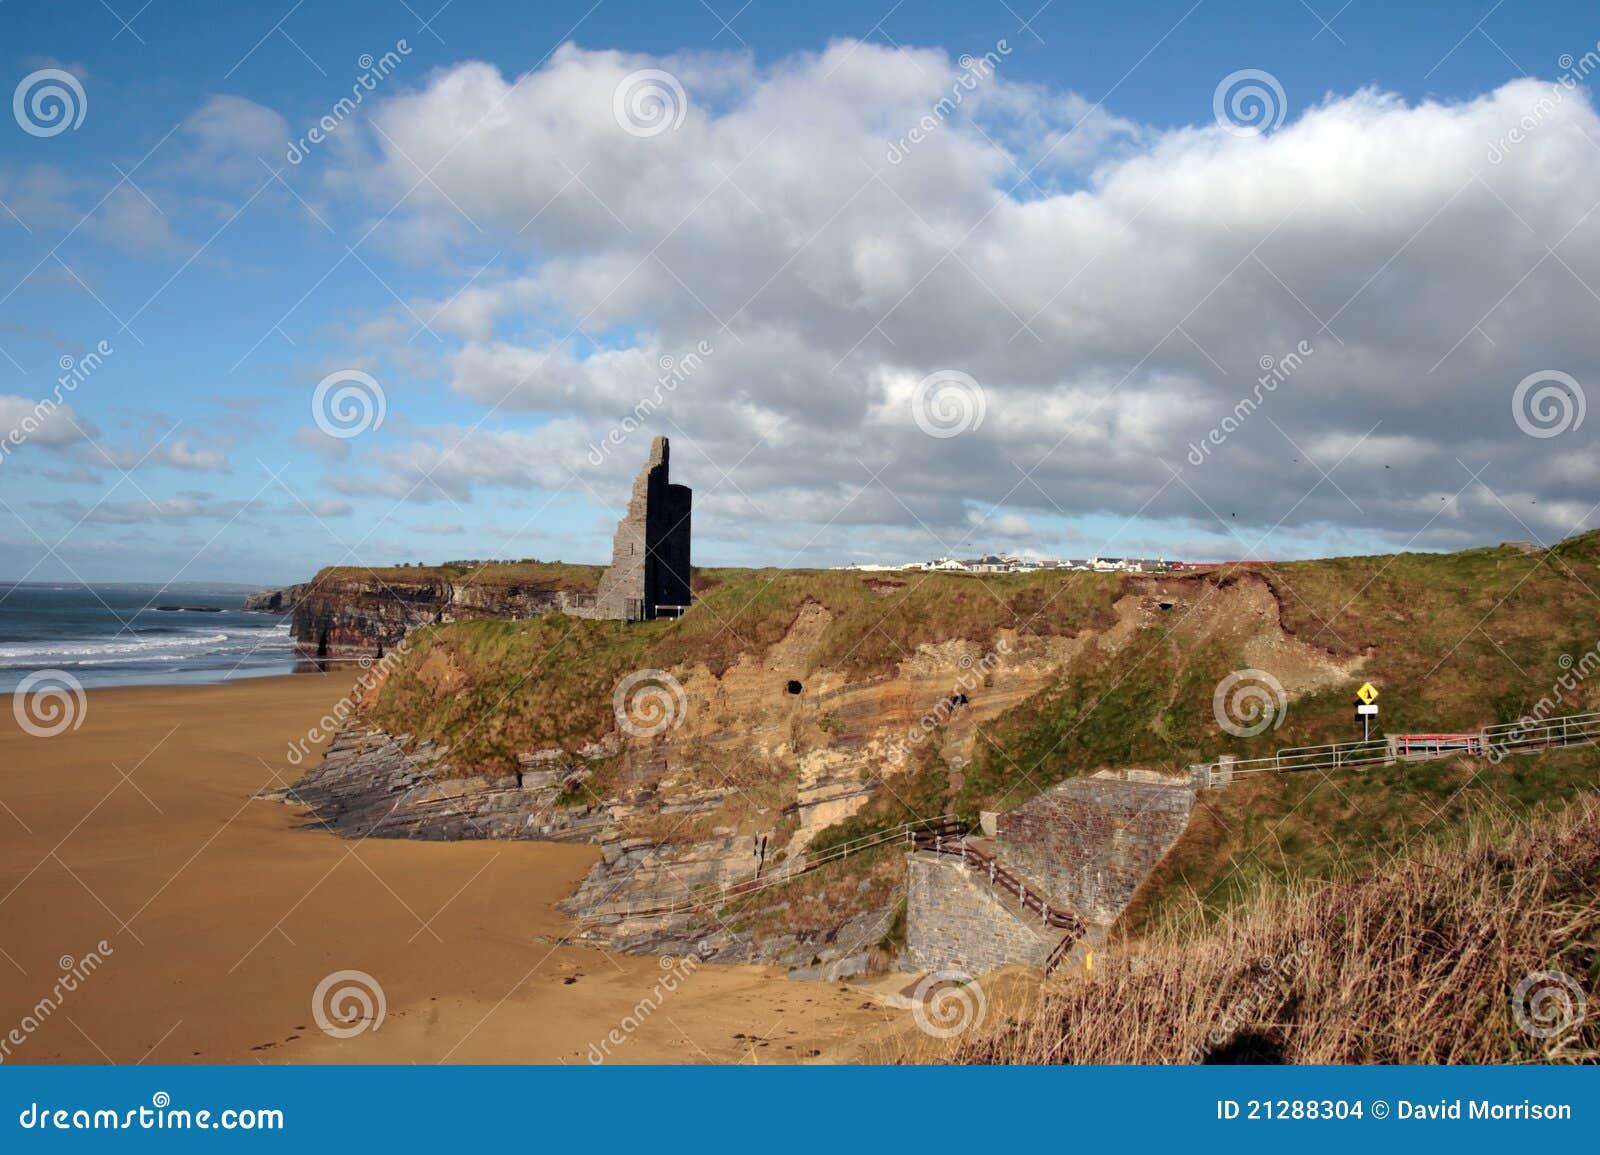 Castle ruins on cliffs above beach